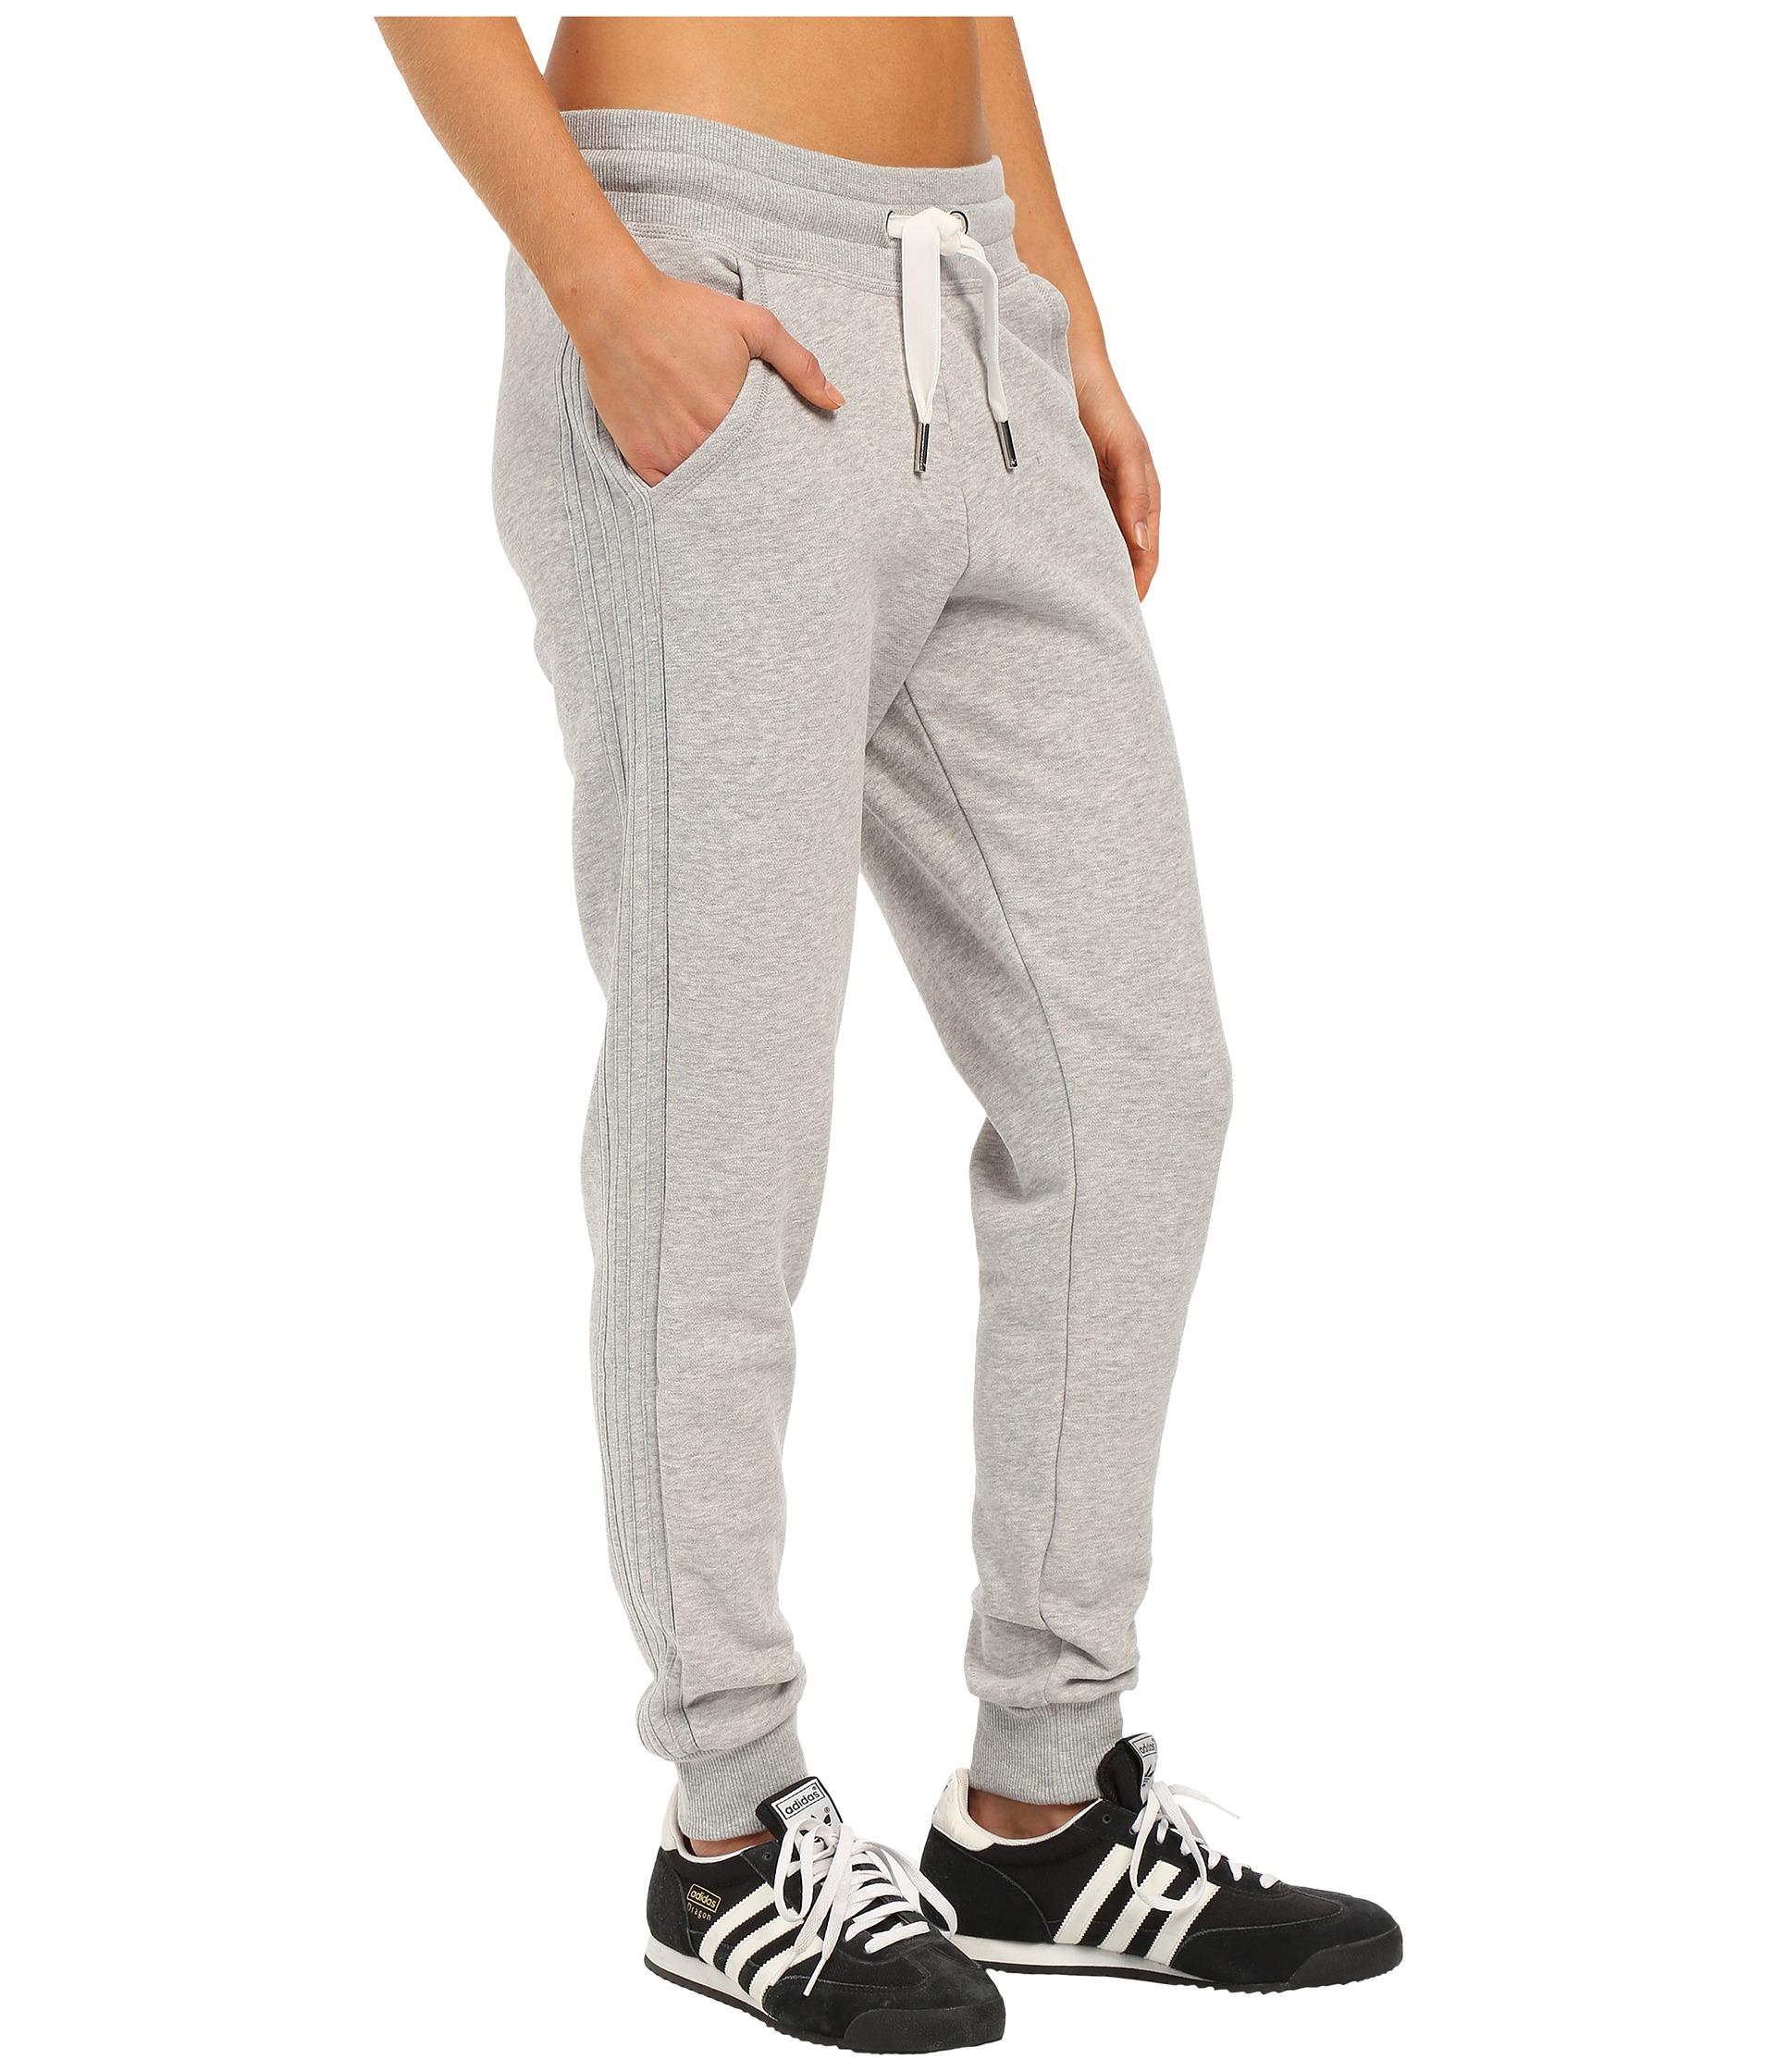 ca5e4456f0f7 Lyst - adidas Originals Slim Cuffed Track Pants in Gray for Men